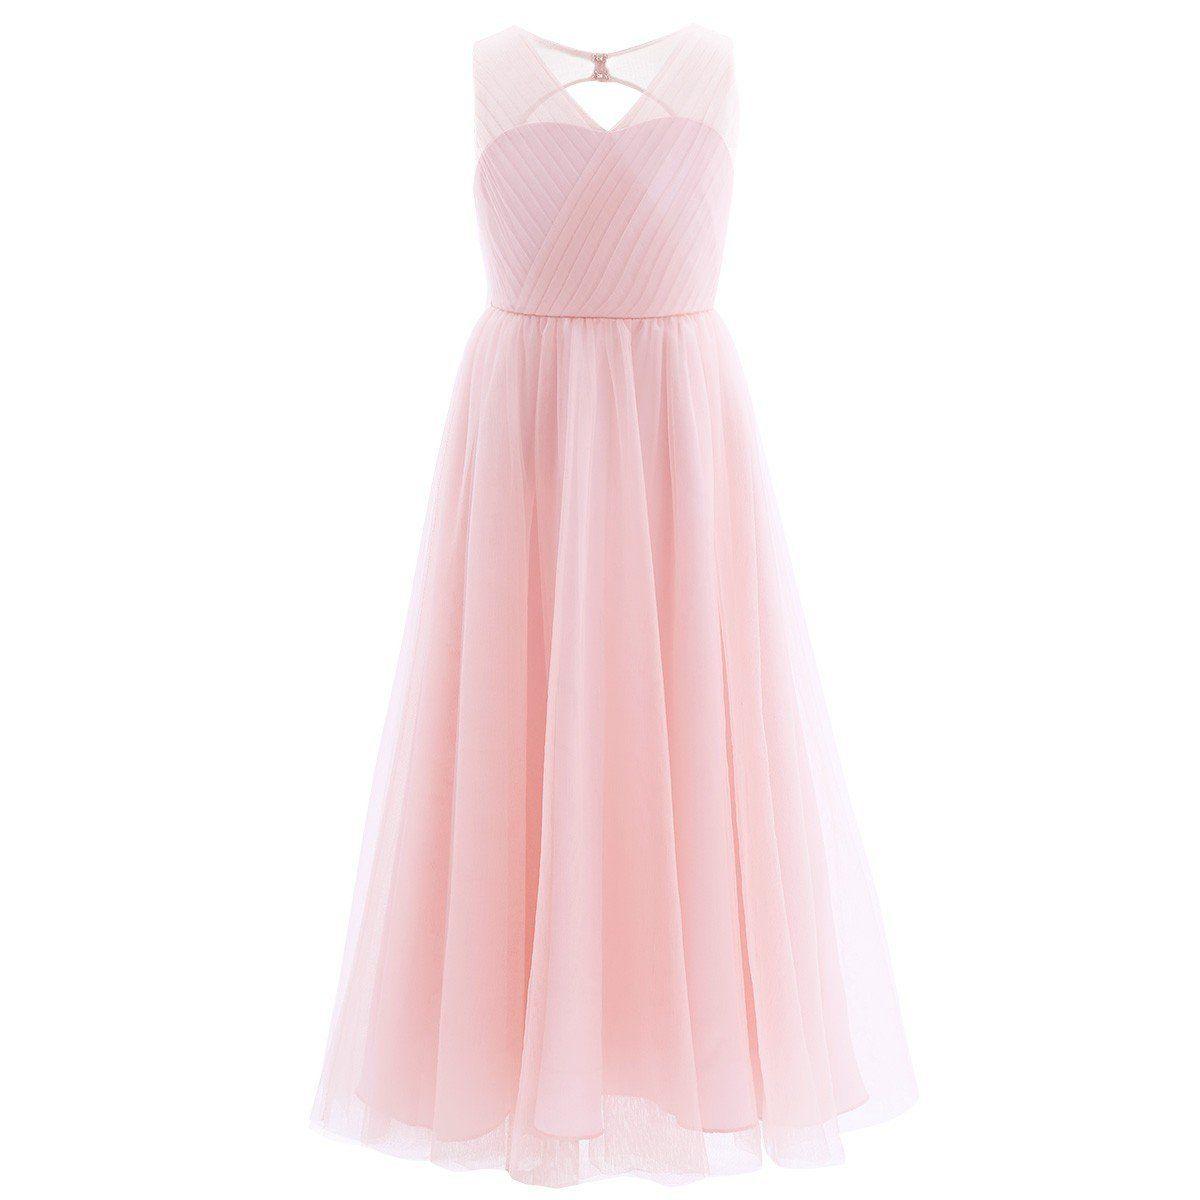 375a64376 YiZYiF Kids Big Girls Backless Mesh Satin Summer Princess Bridesmaid Wedding  Dance Prom Party Dress: